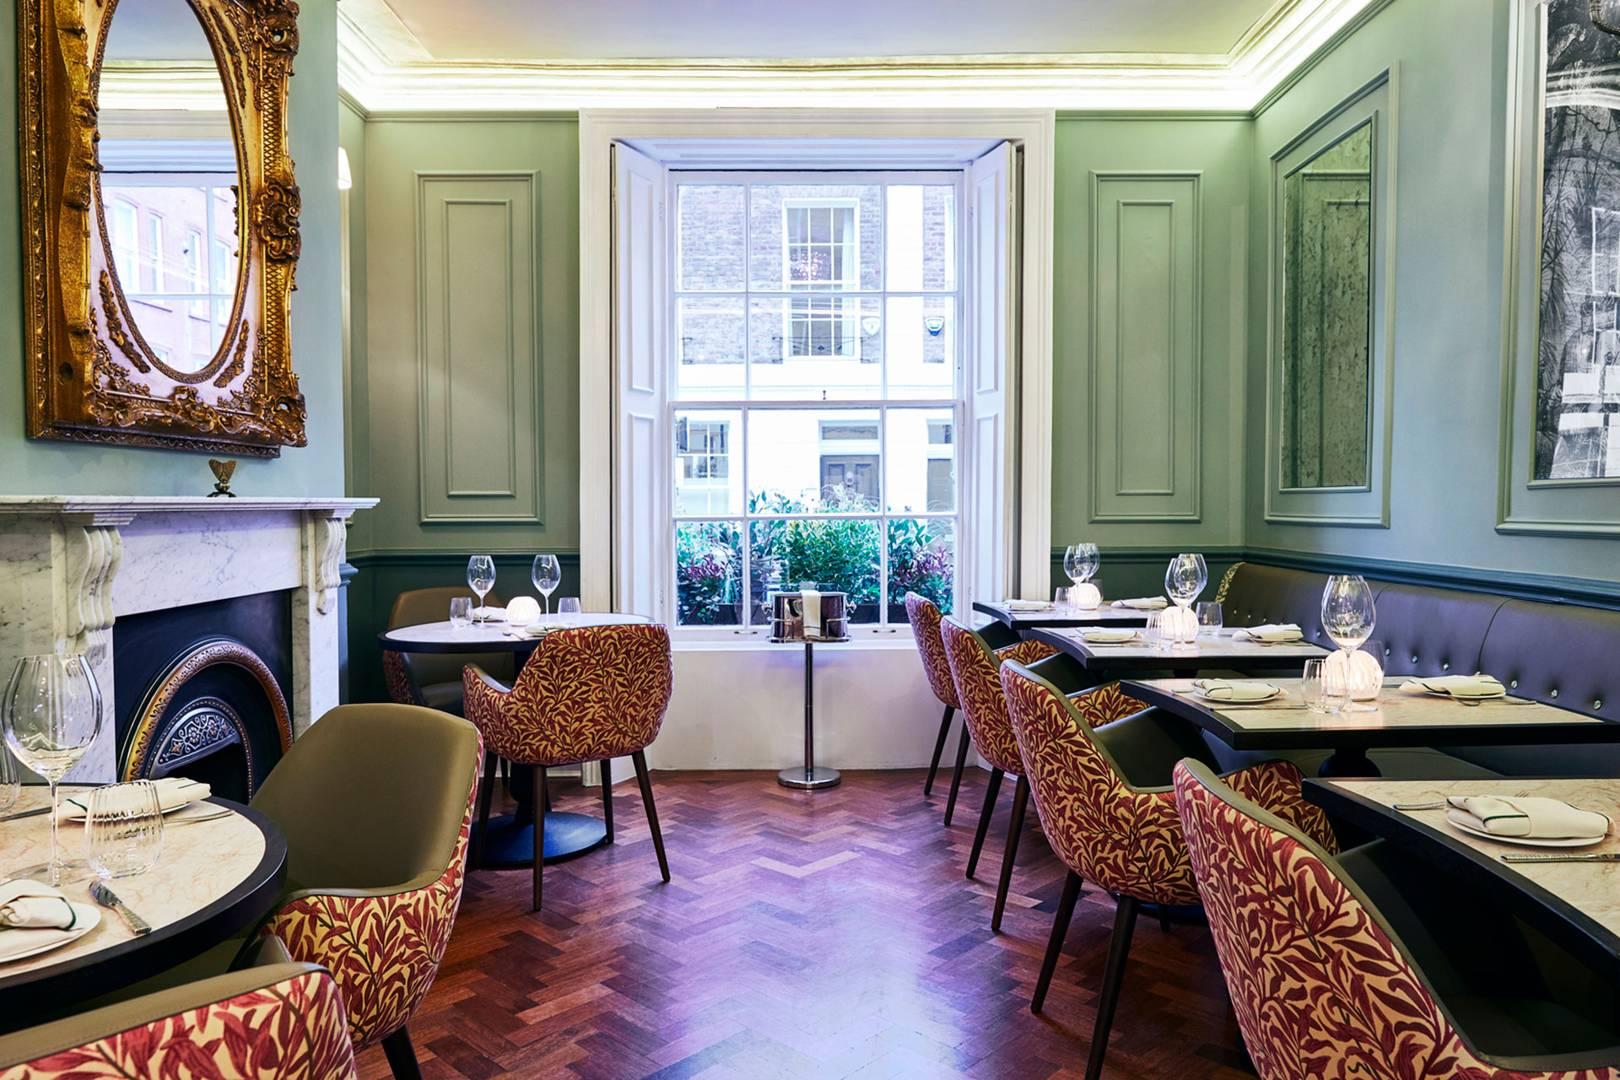 030a5d31235b8 Best restaurants in London 2019